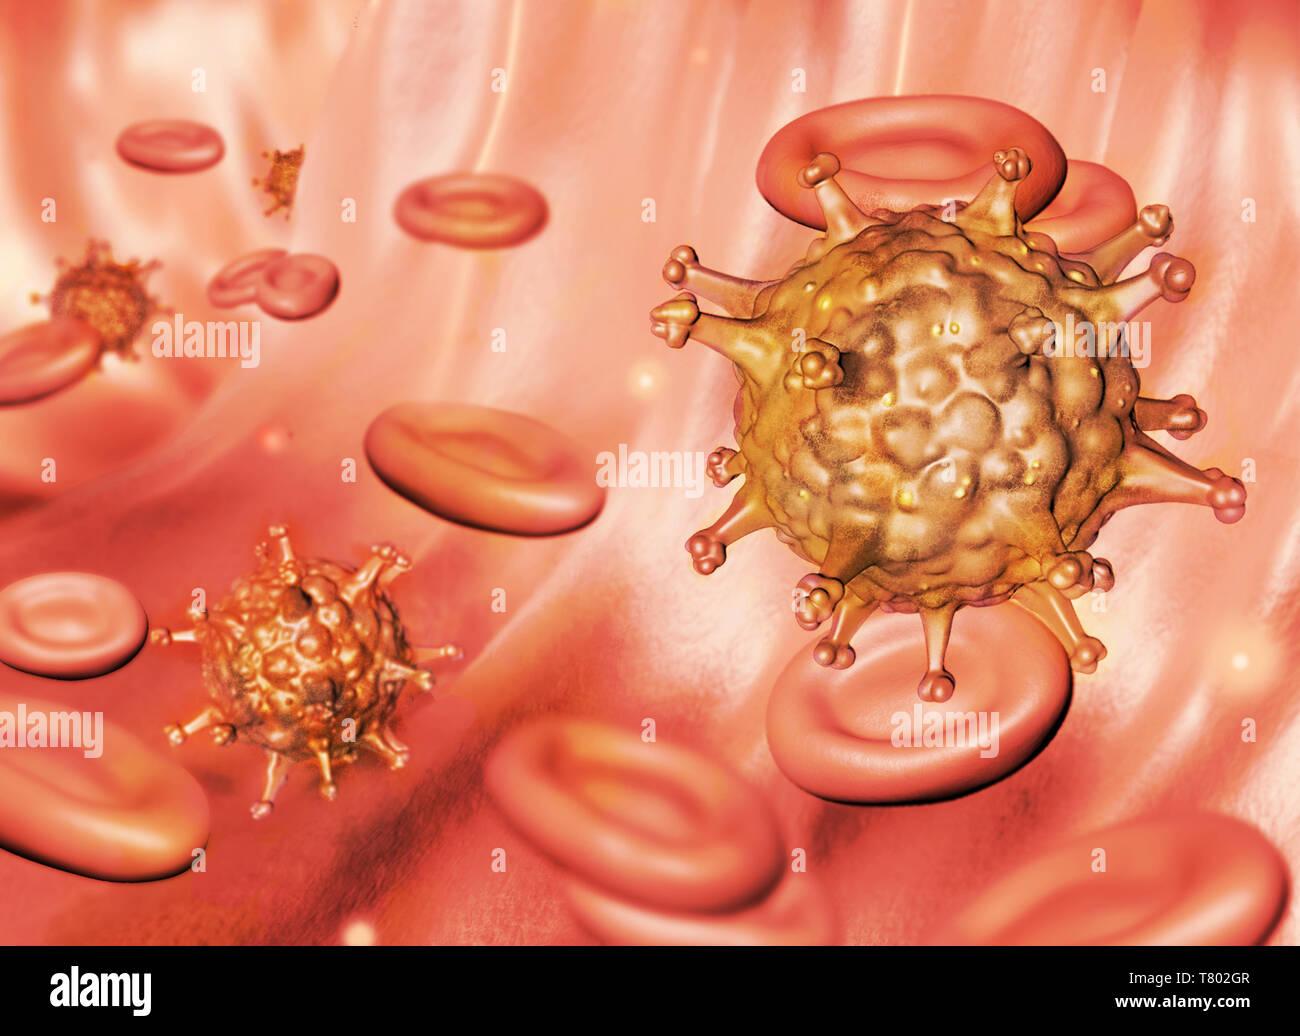 HIV, Illustration - Stock Image